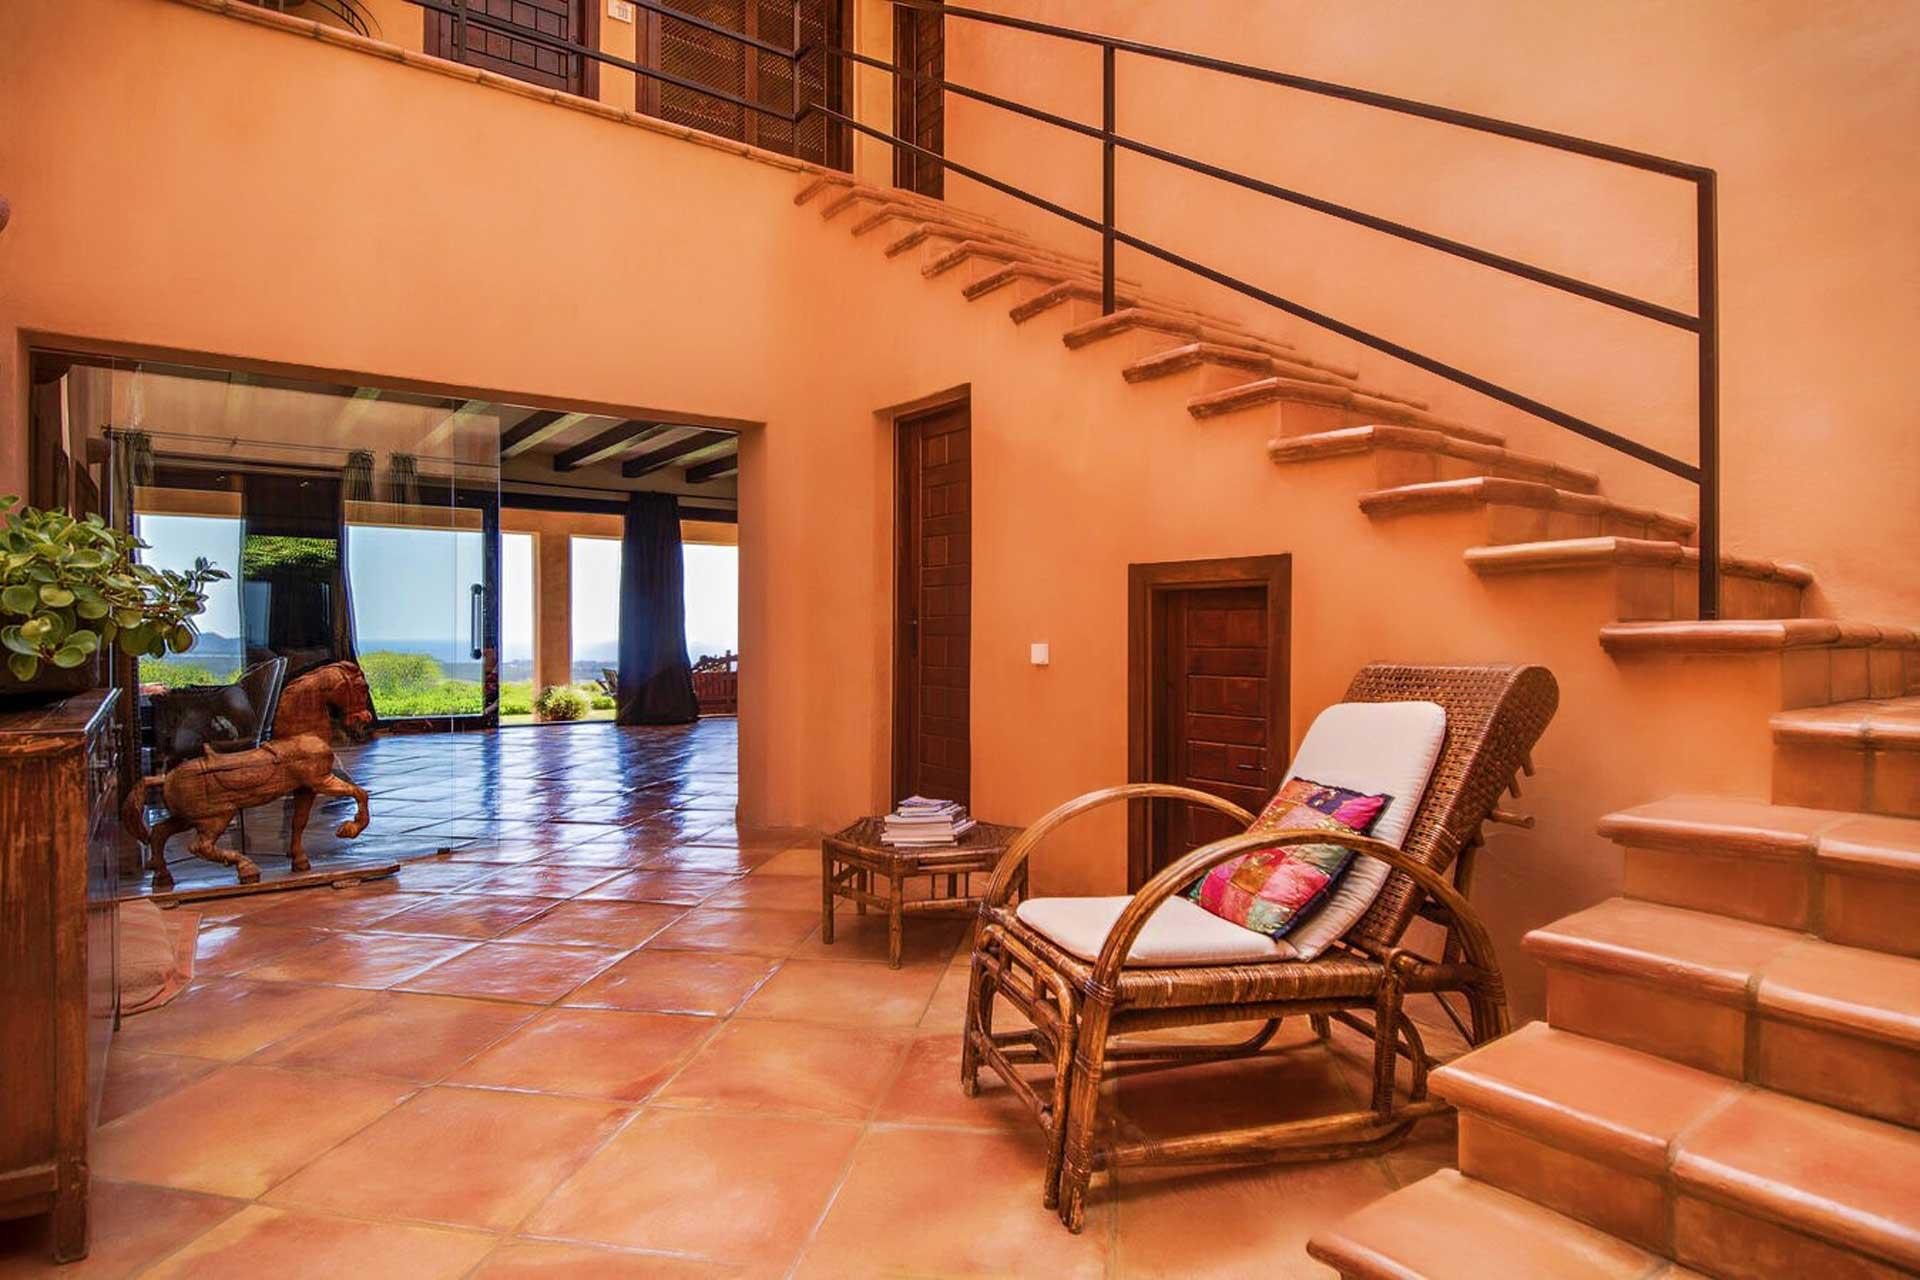 Villa K IBIZA - Flur und Treppenaufgang